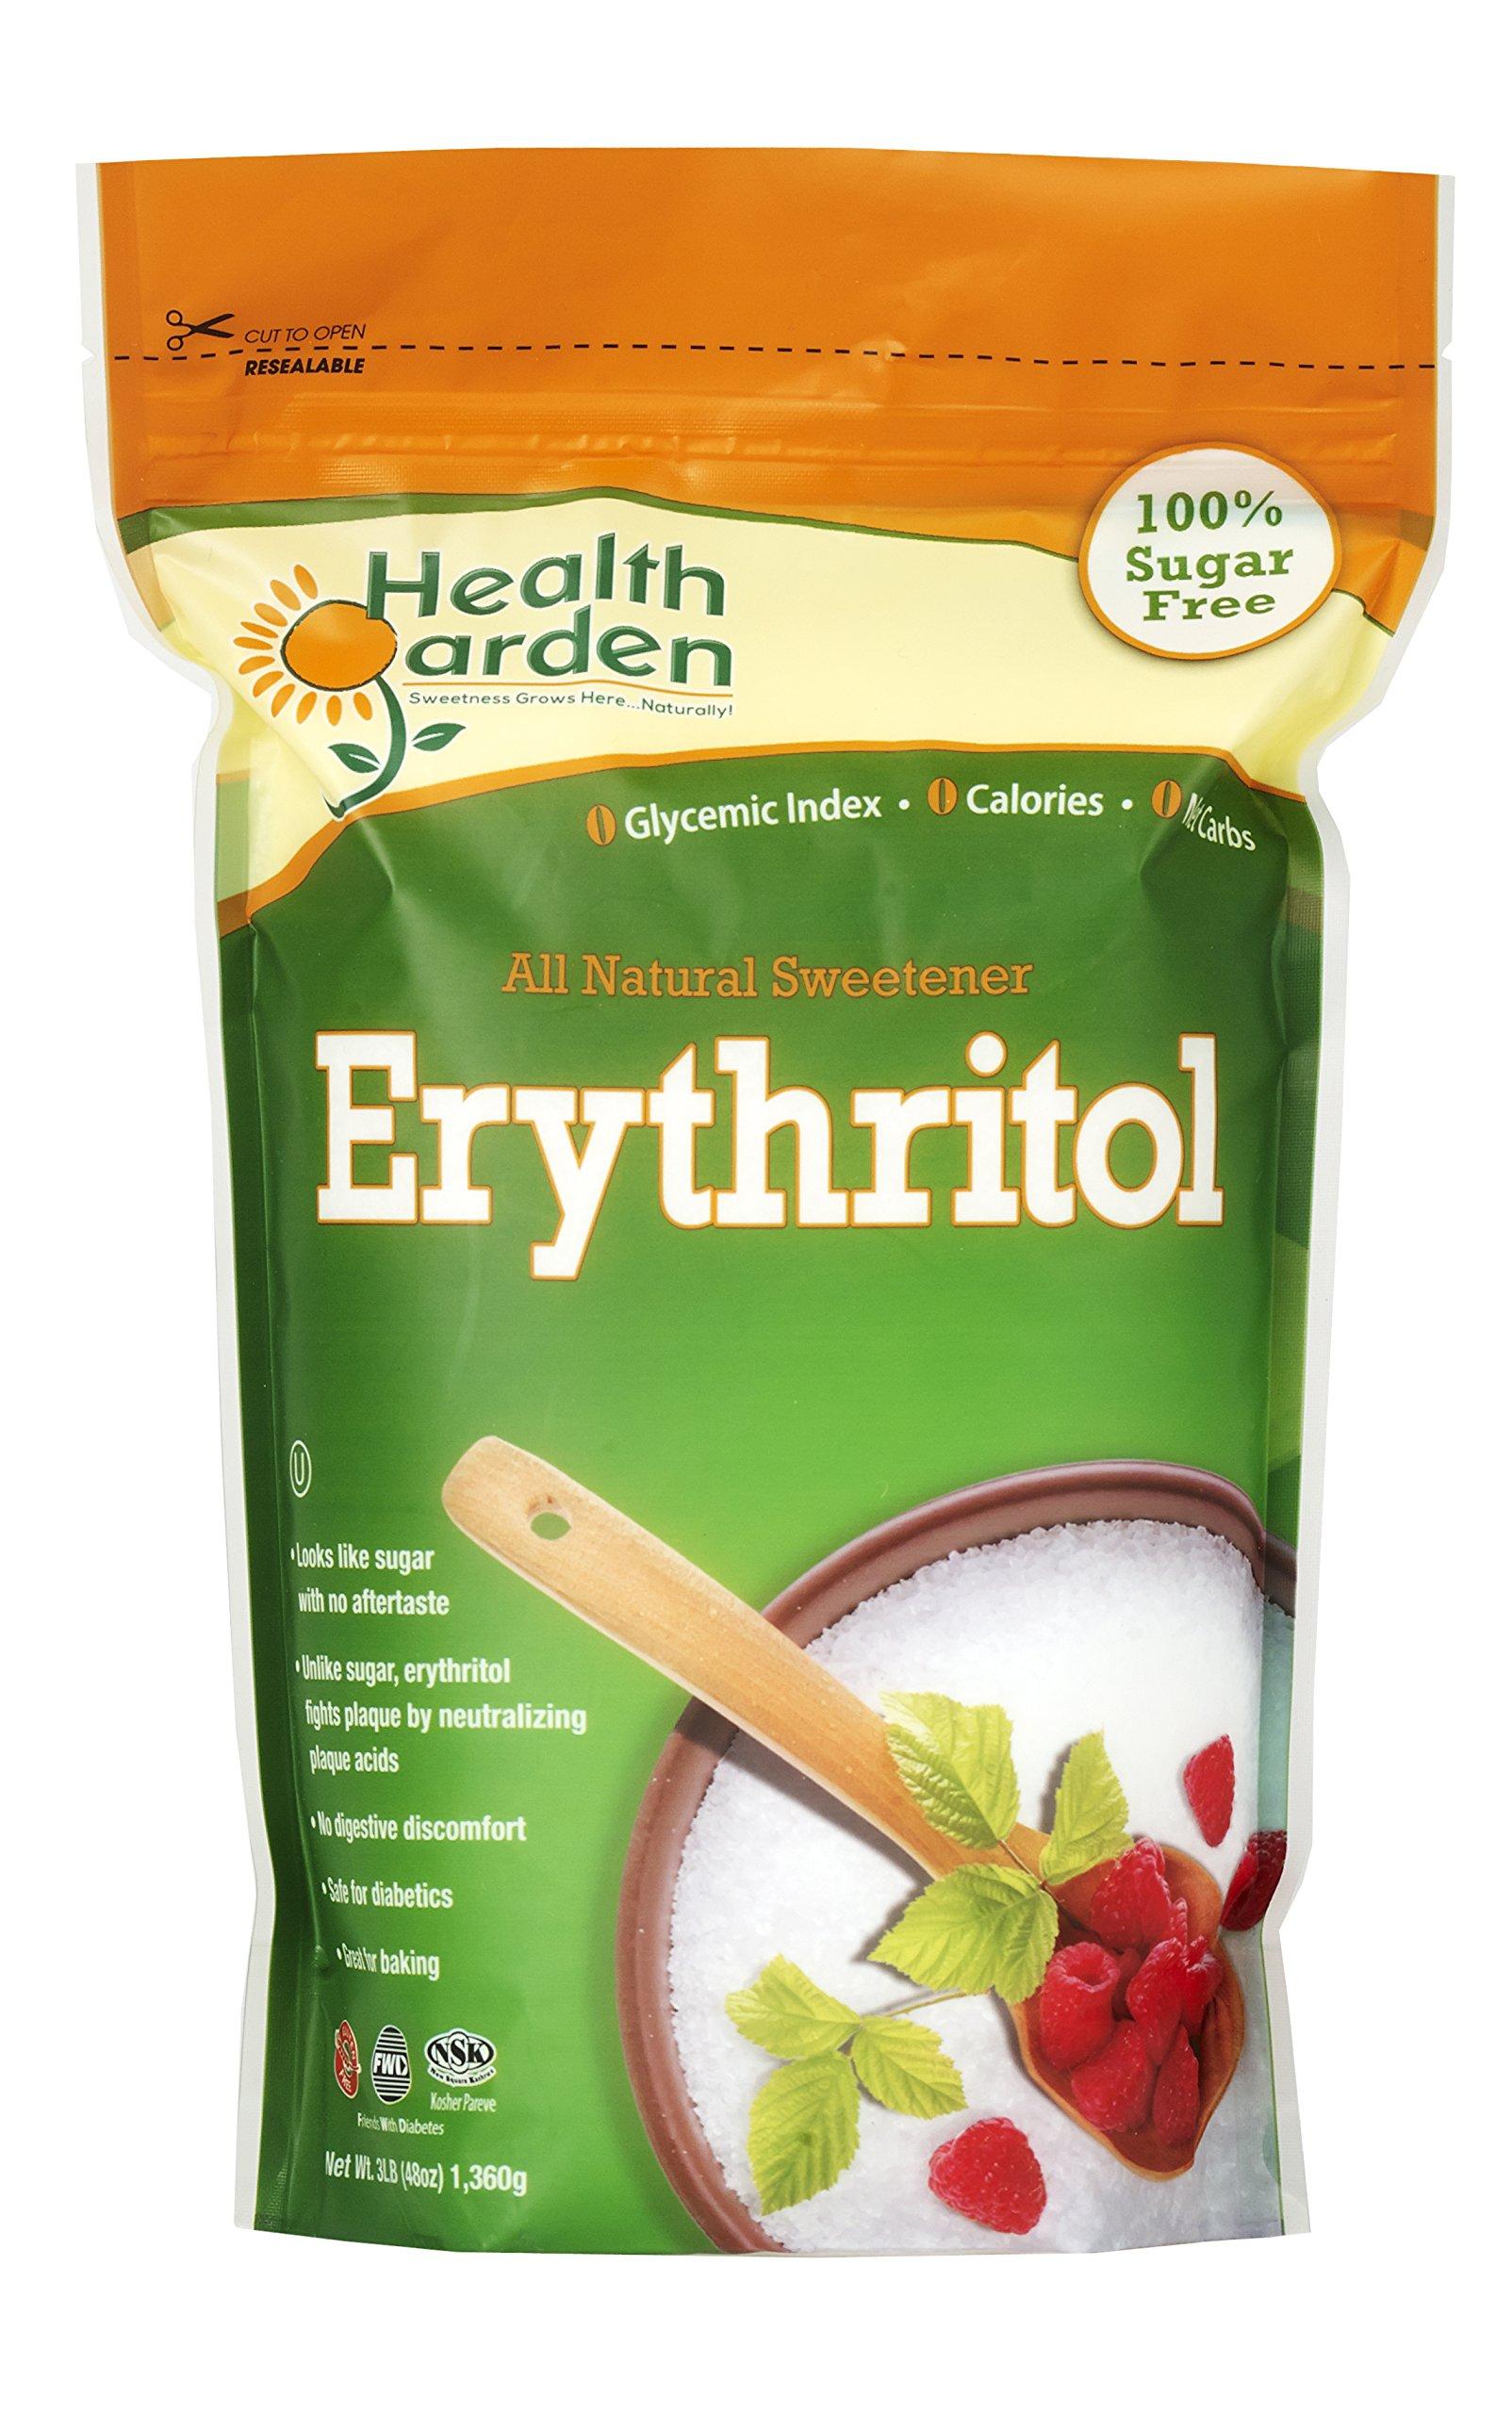 Erythritol Sugar Free Sweetener - 100% Natural & Non GMO Sugar Substitute - Health Garden (3 LB)